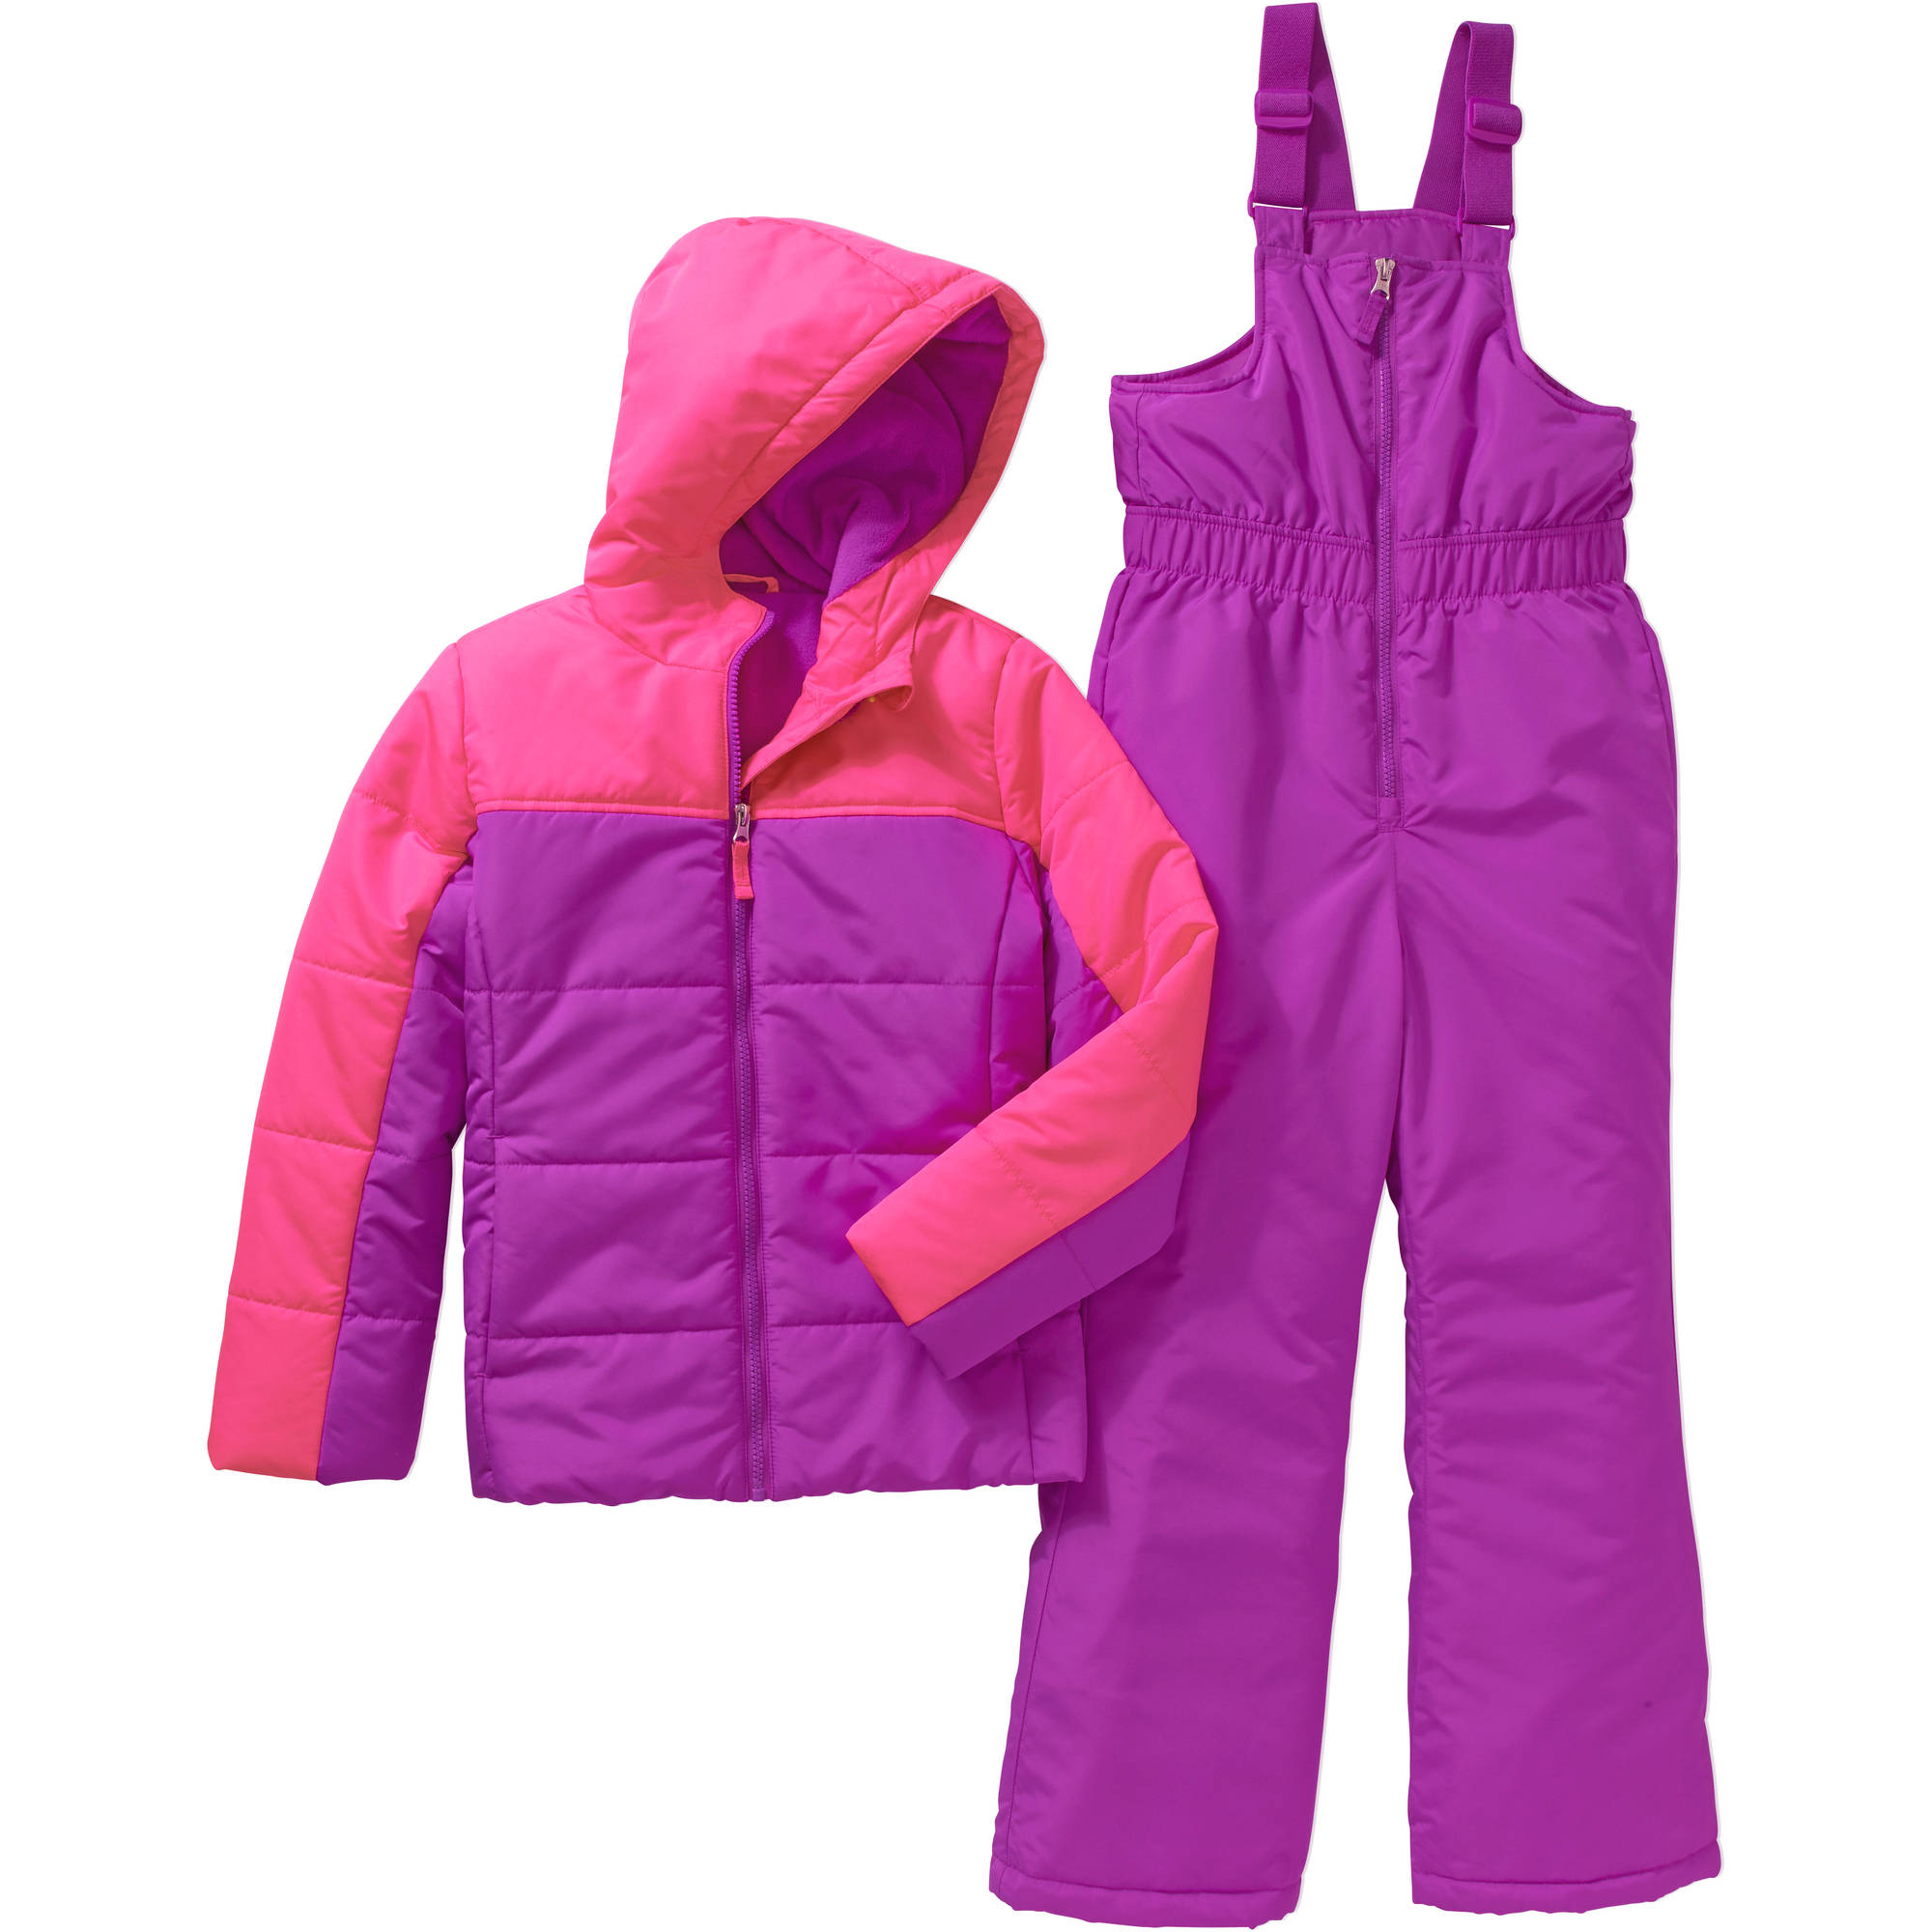 Girls' Performance Ski Bib and Coat 2 Piece Set